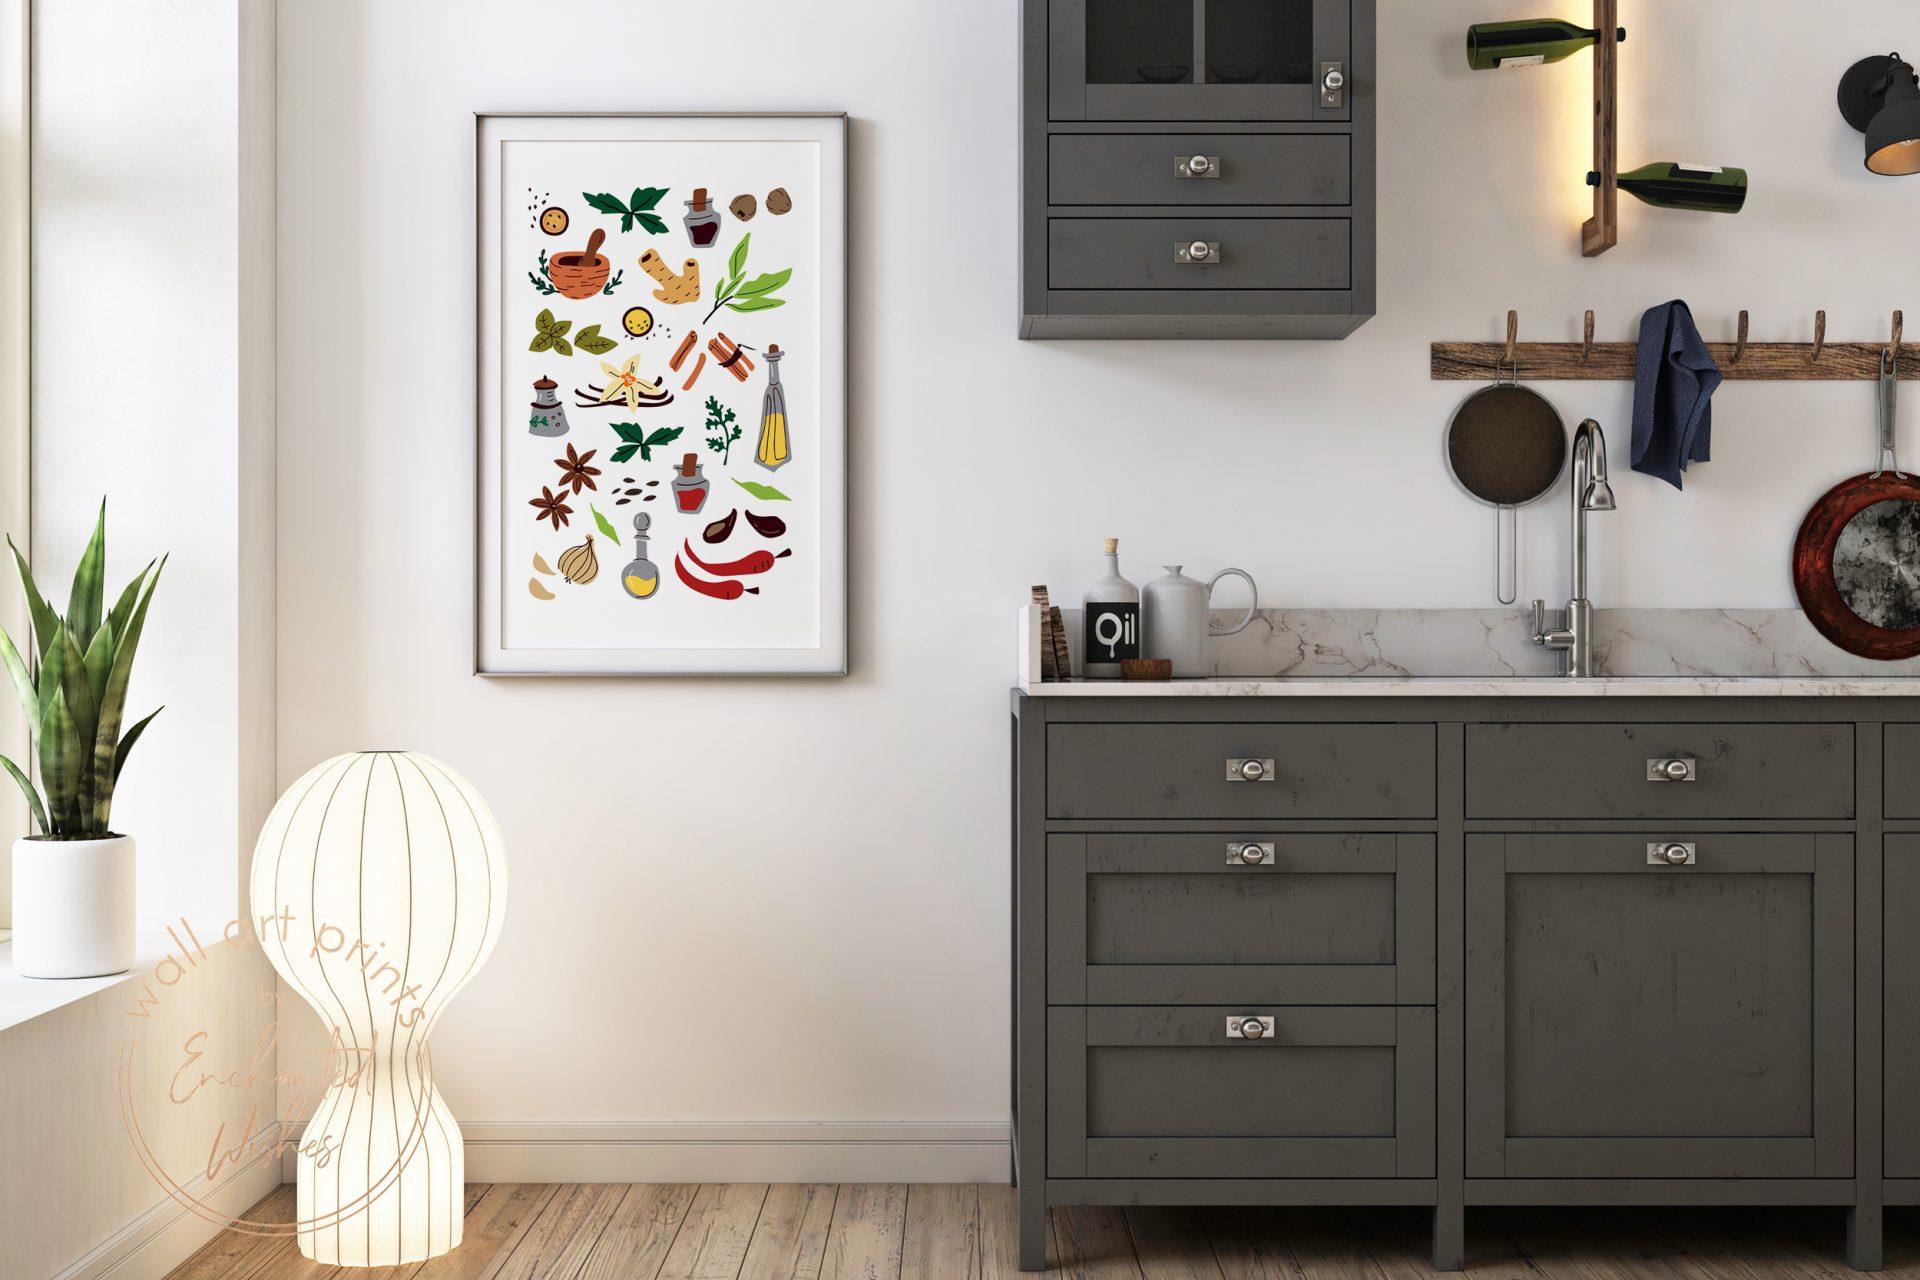 Kitchen doodles print